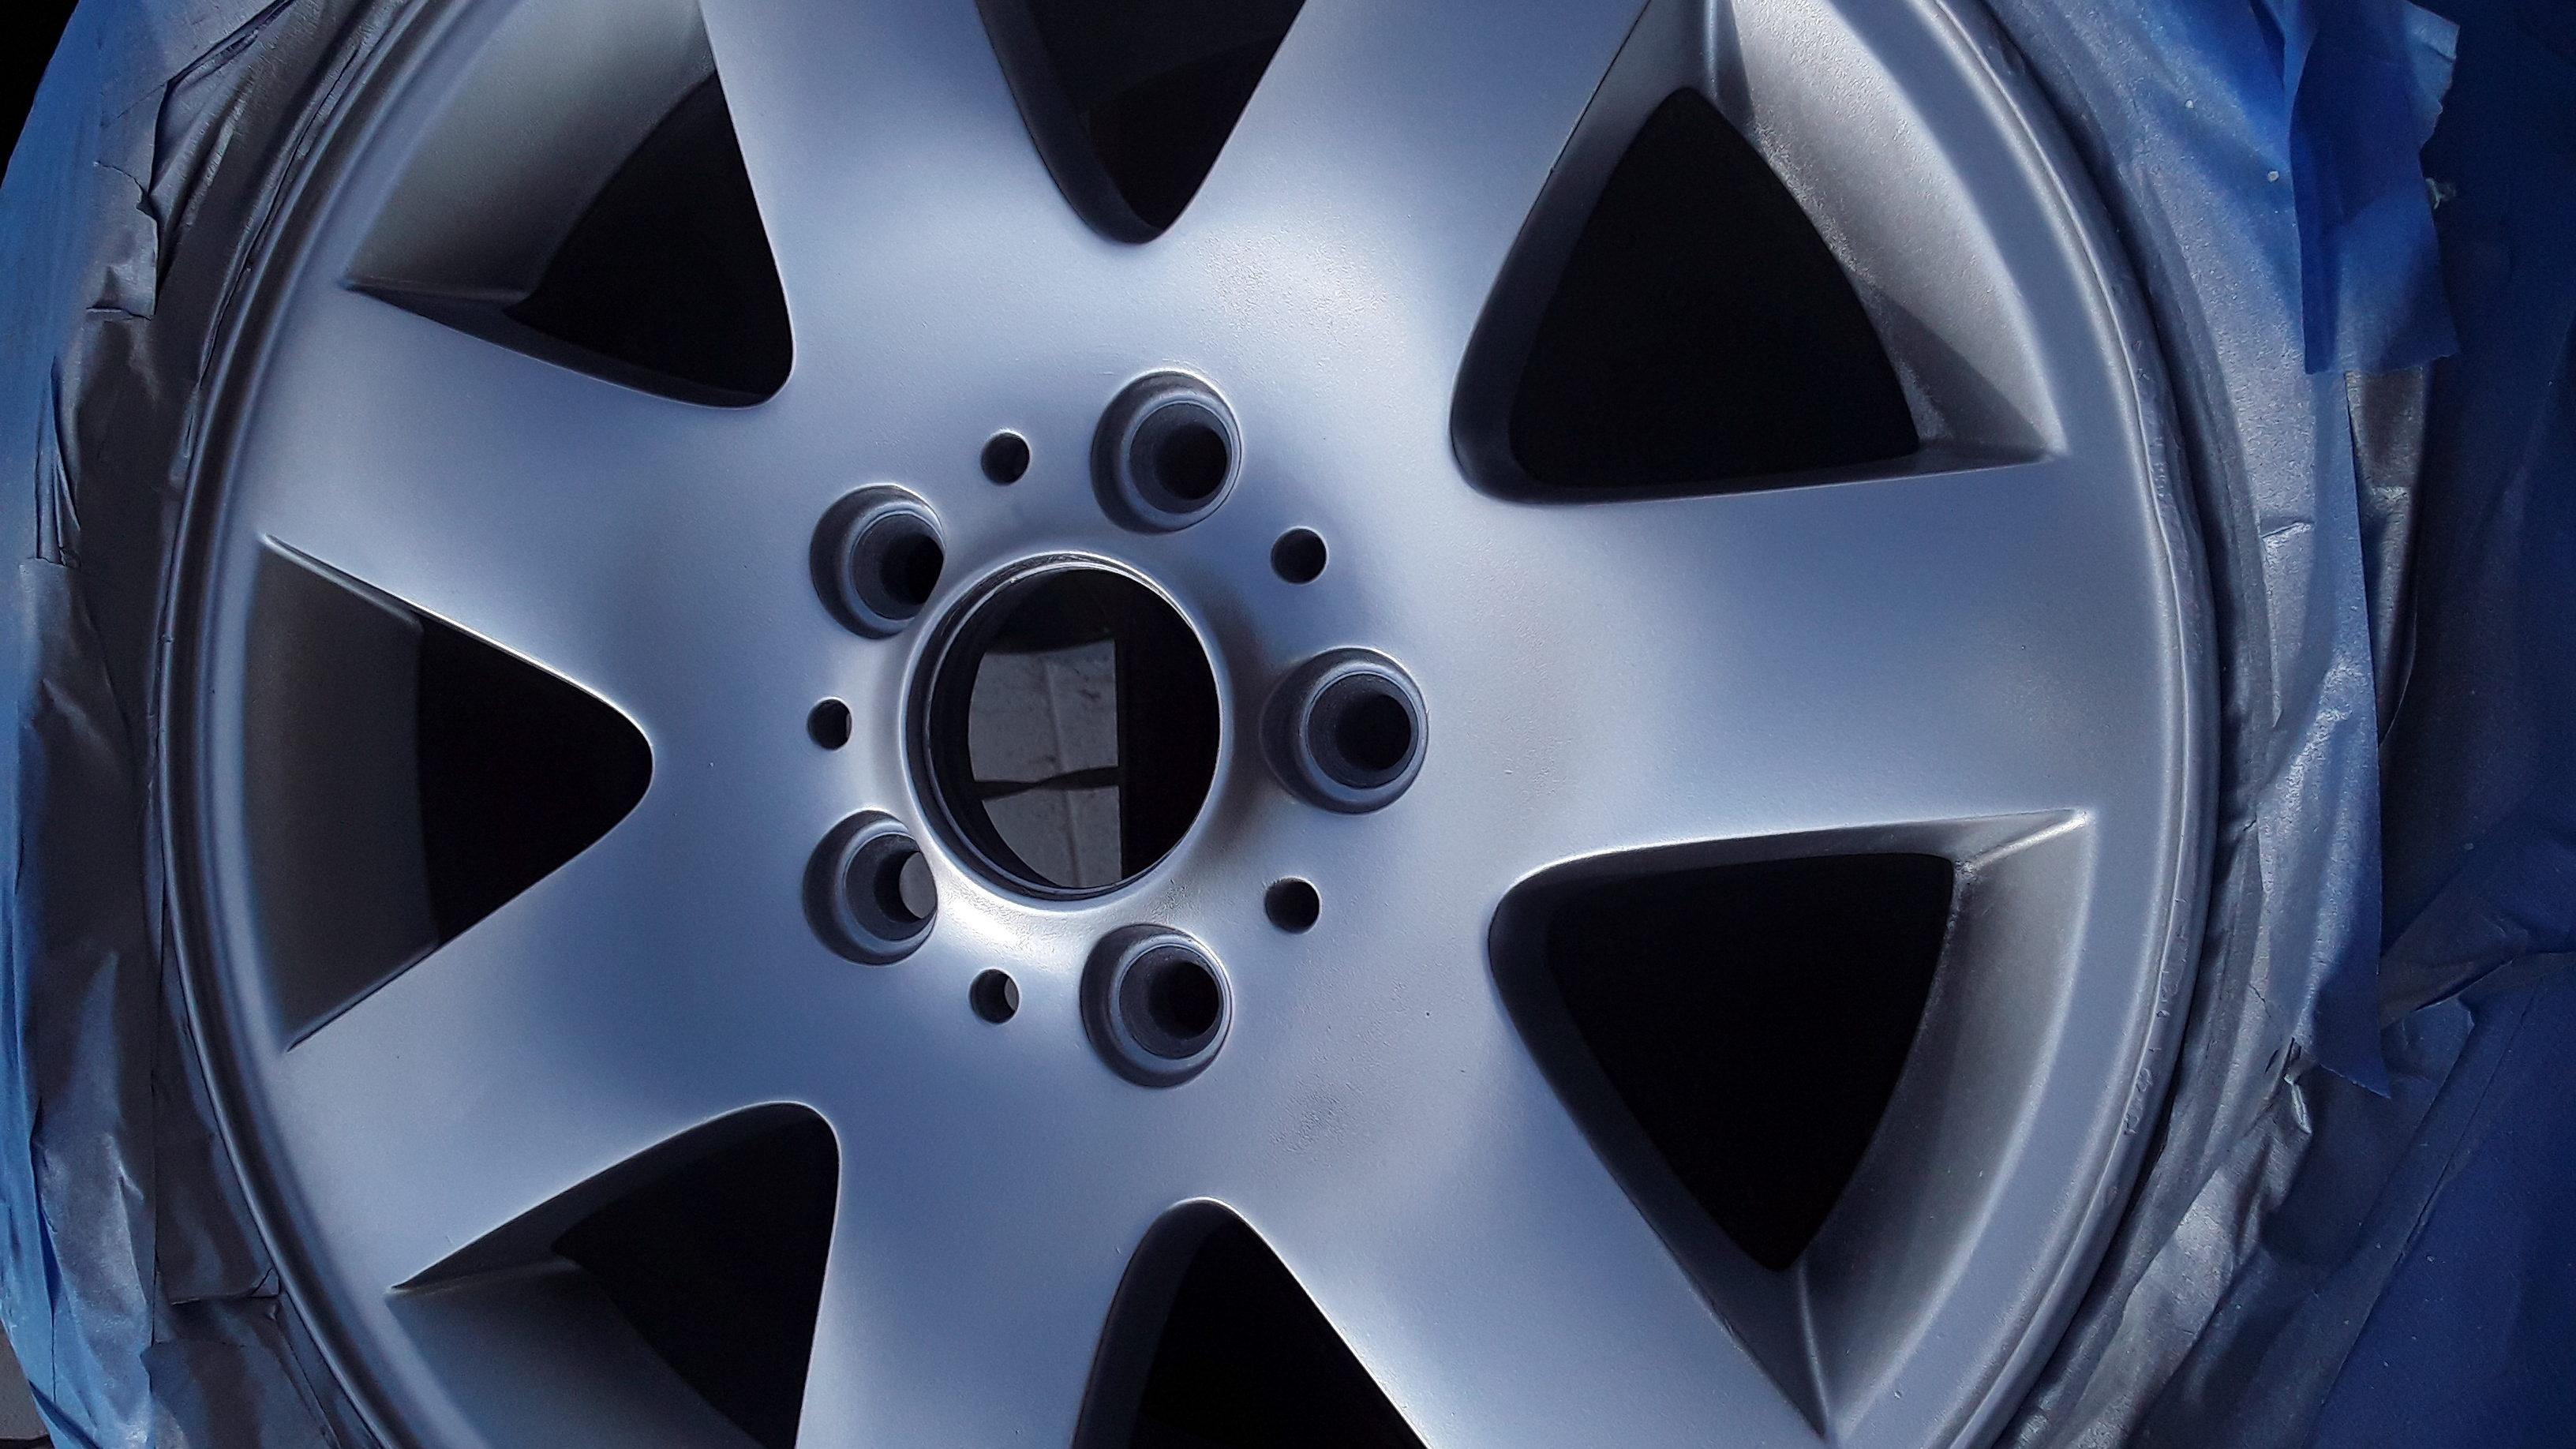 Vehicle wheels